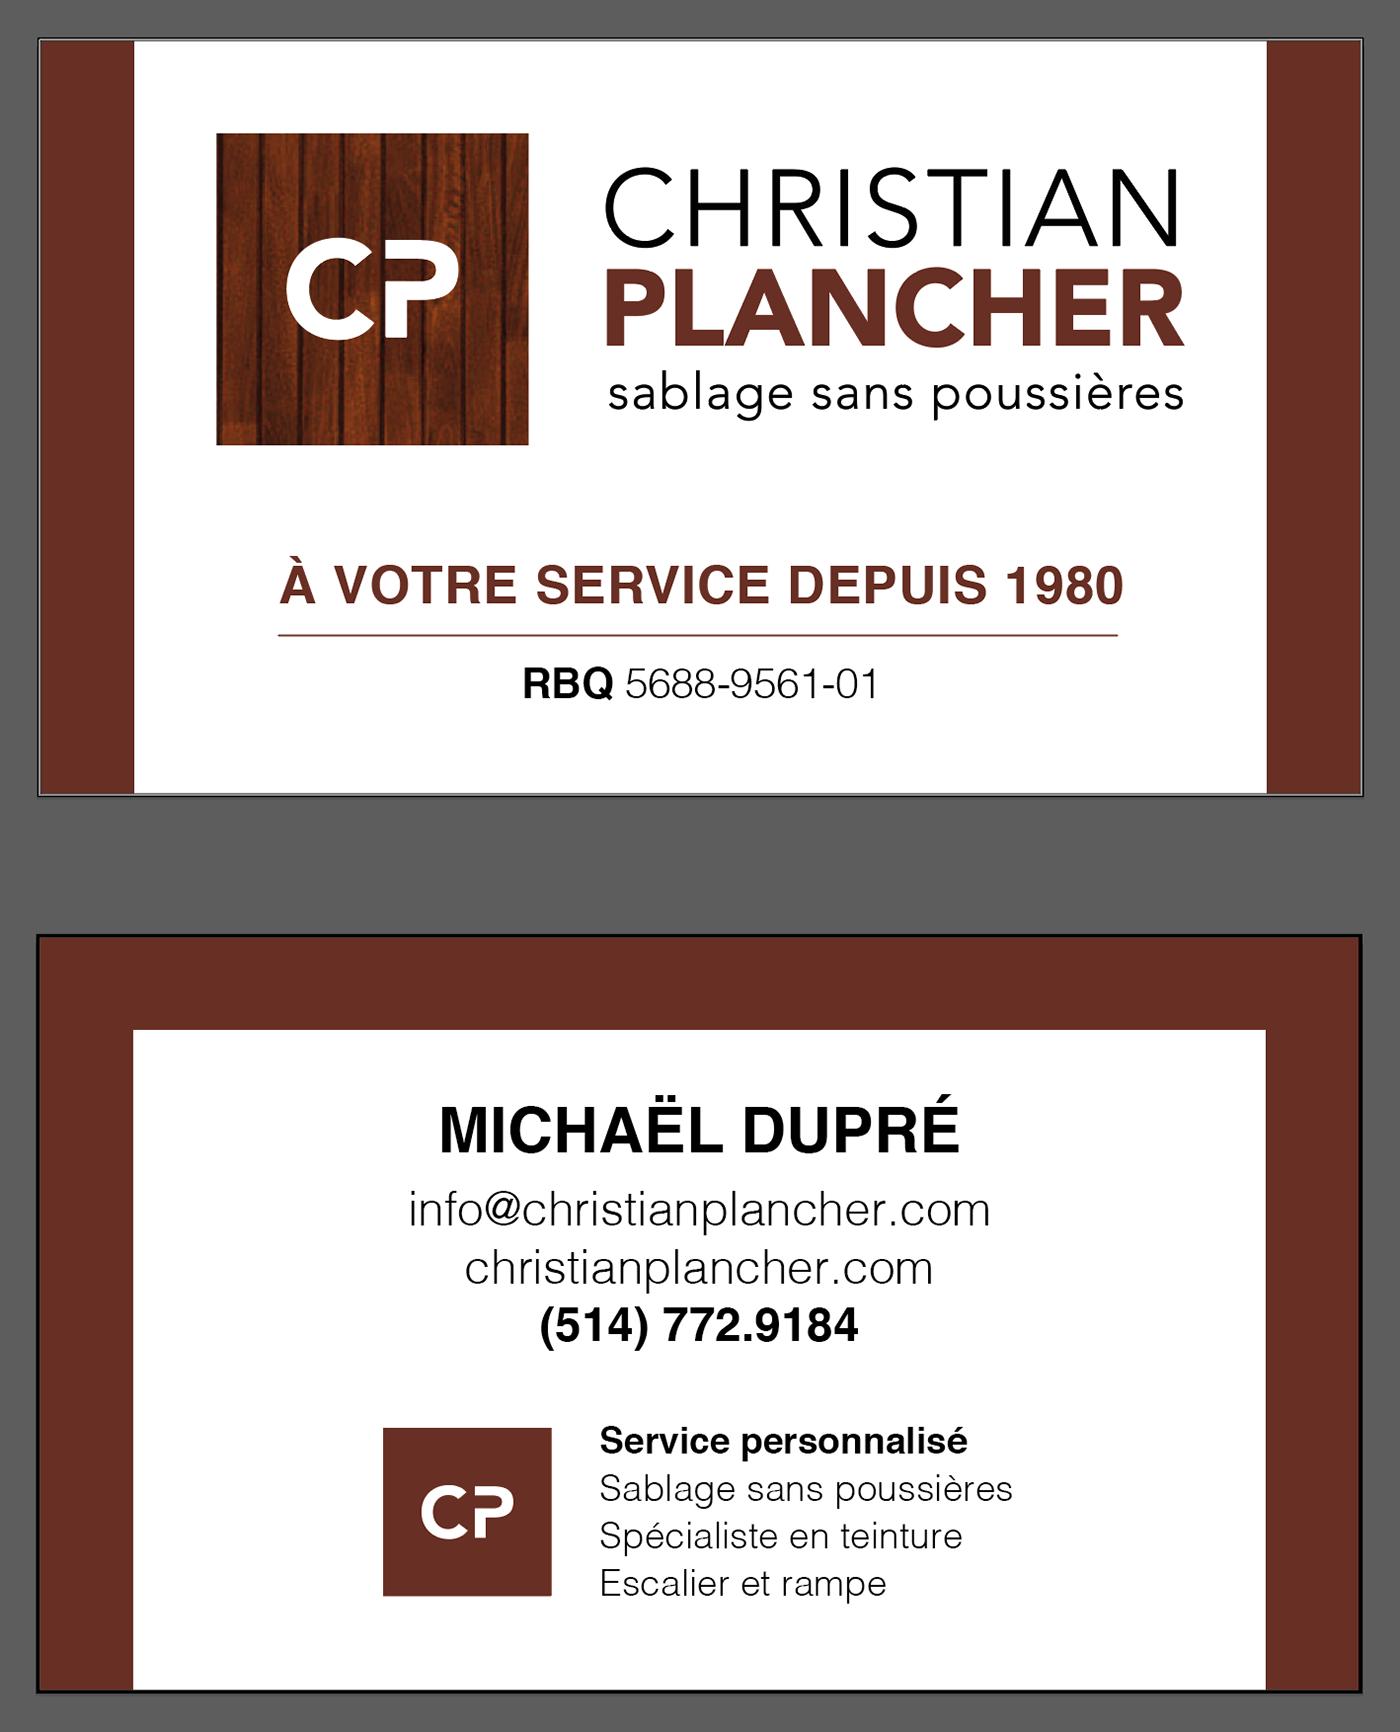 Christian Plancher - Rebranding + Web Site